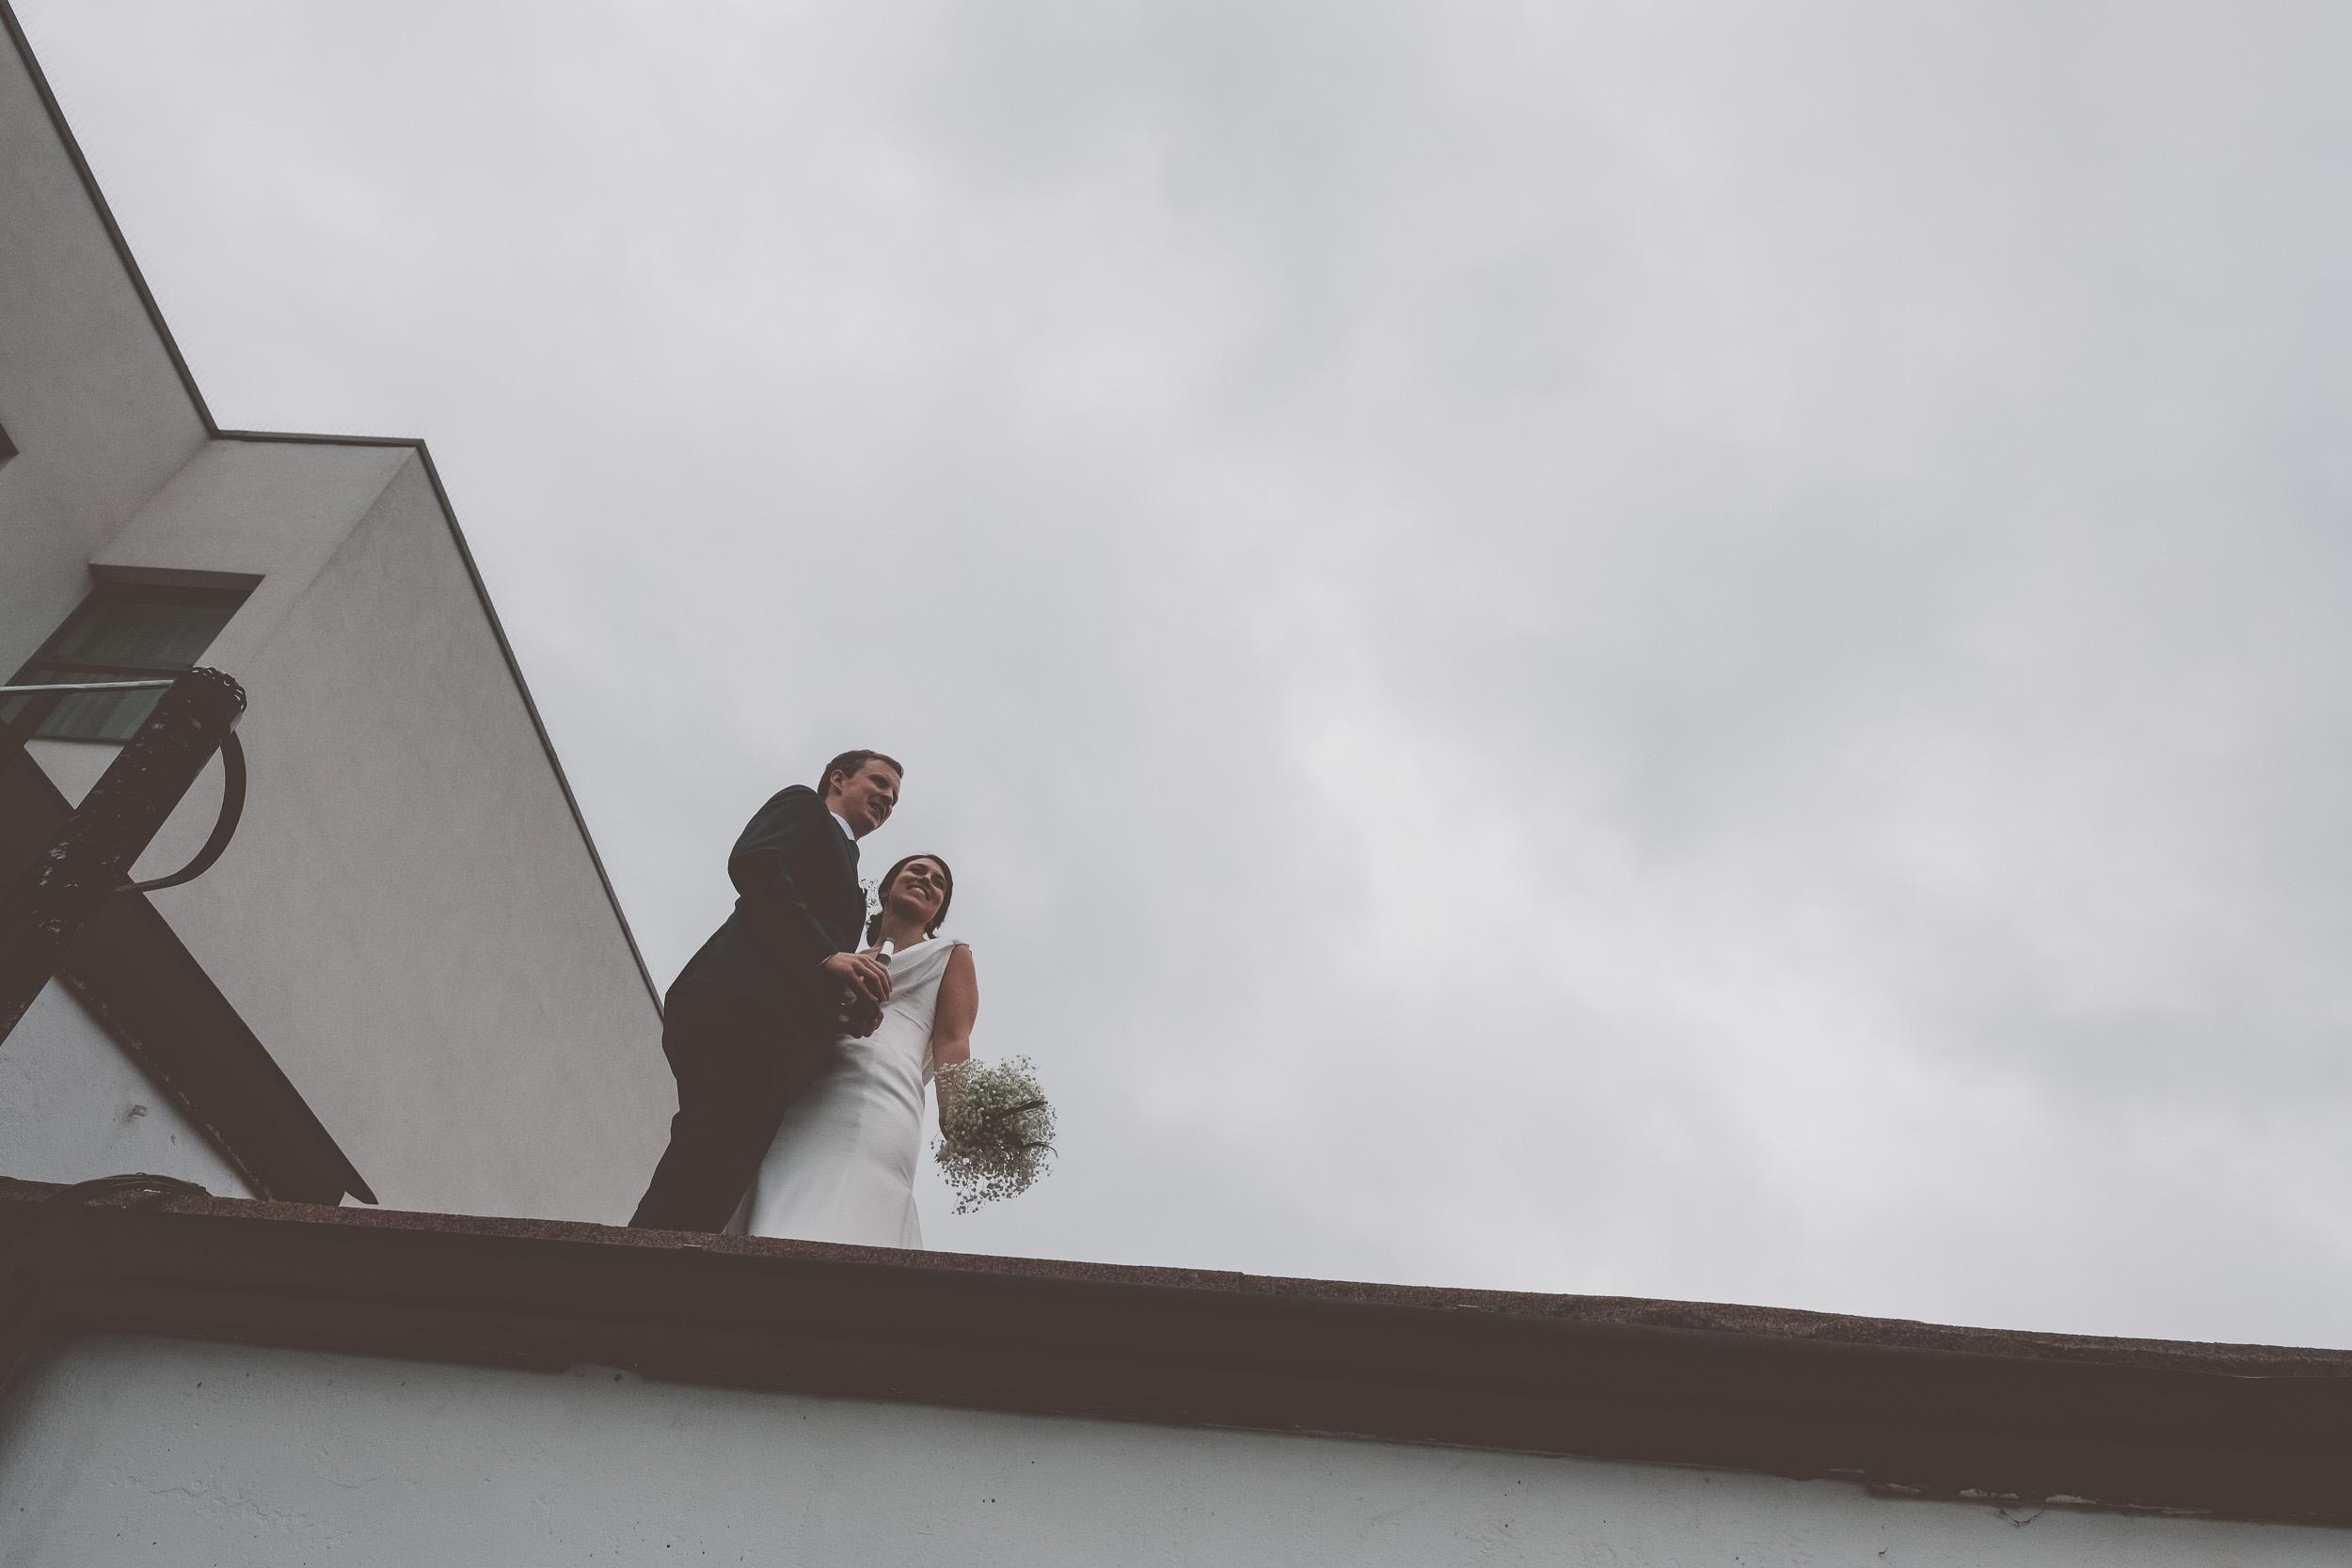 islington-town-hall-4th-floor-studios-wedding244.jpg